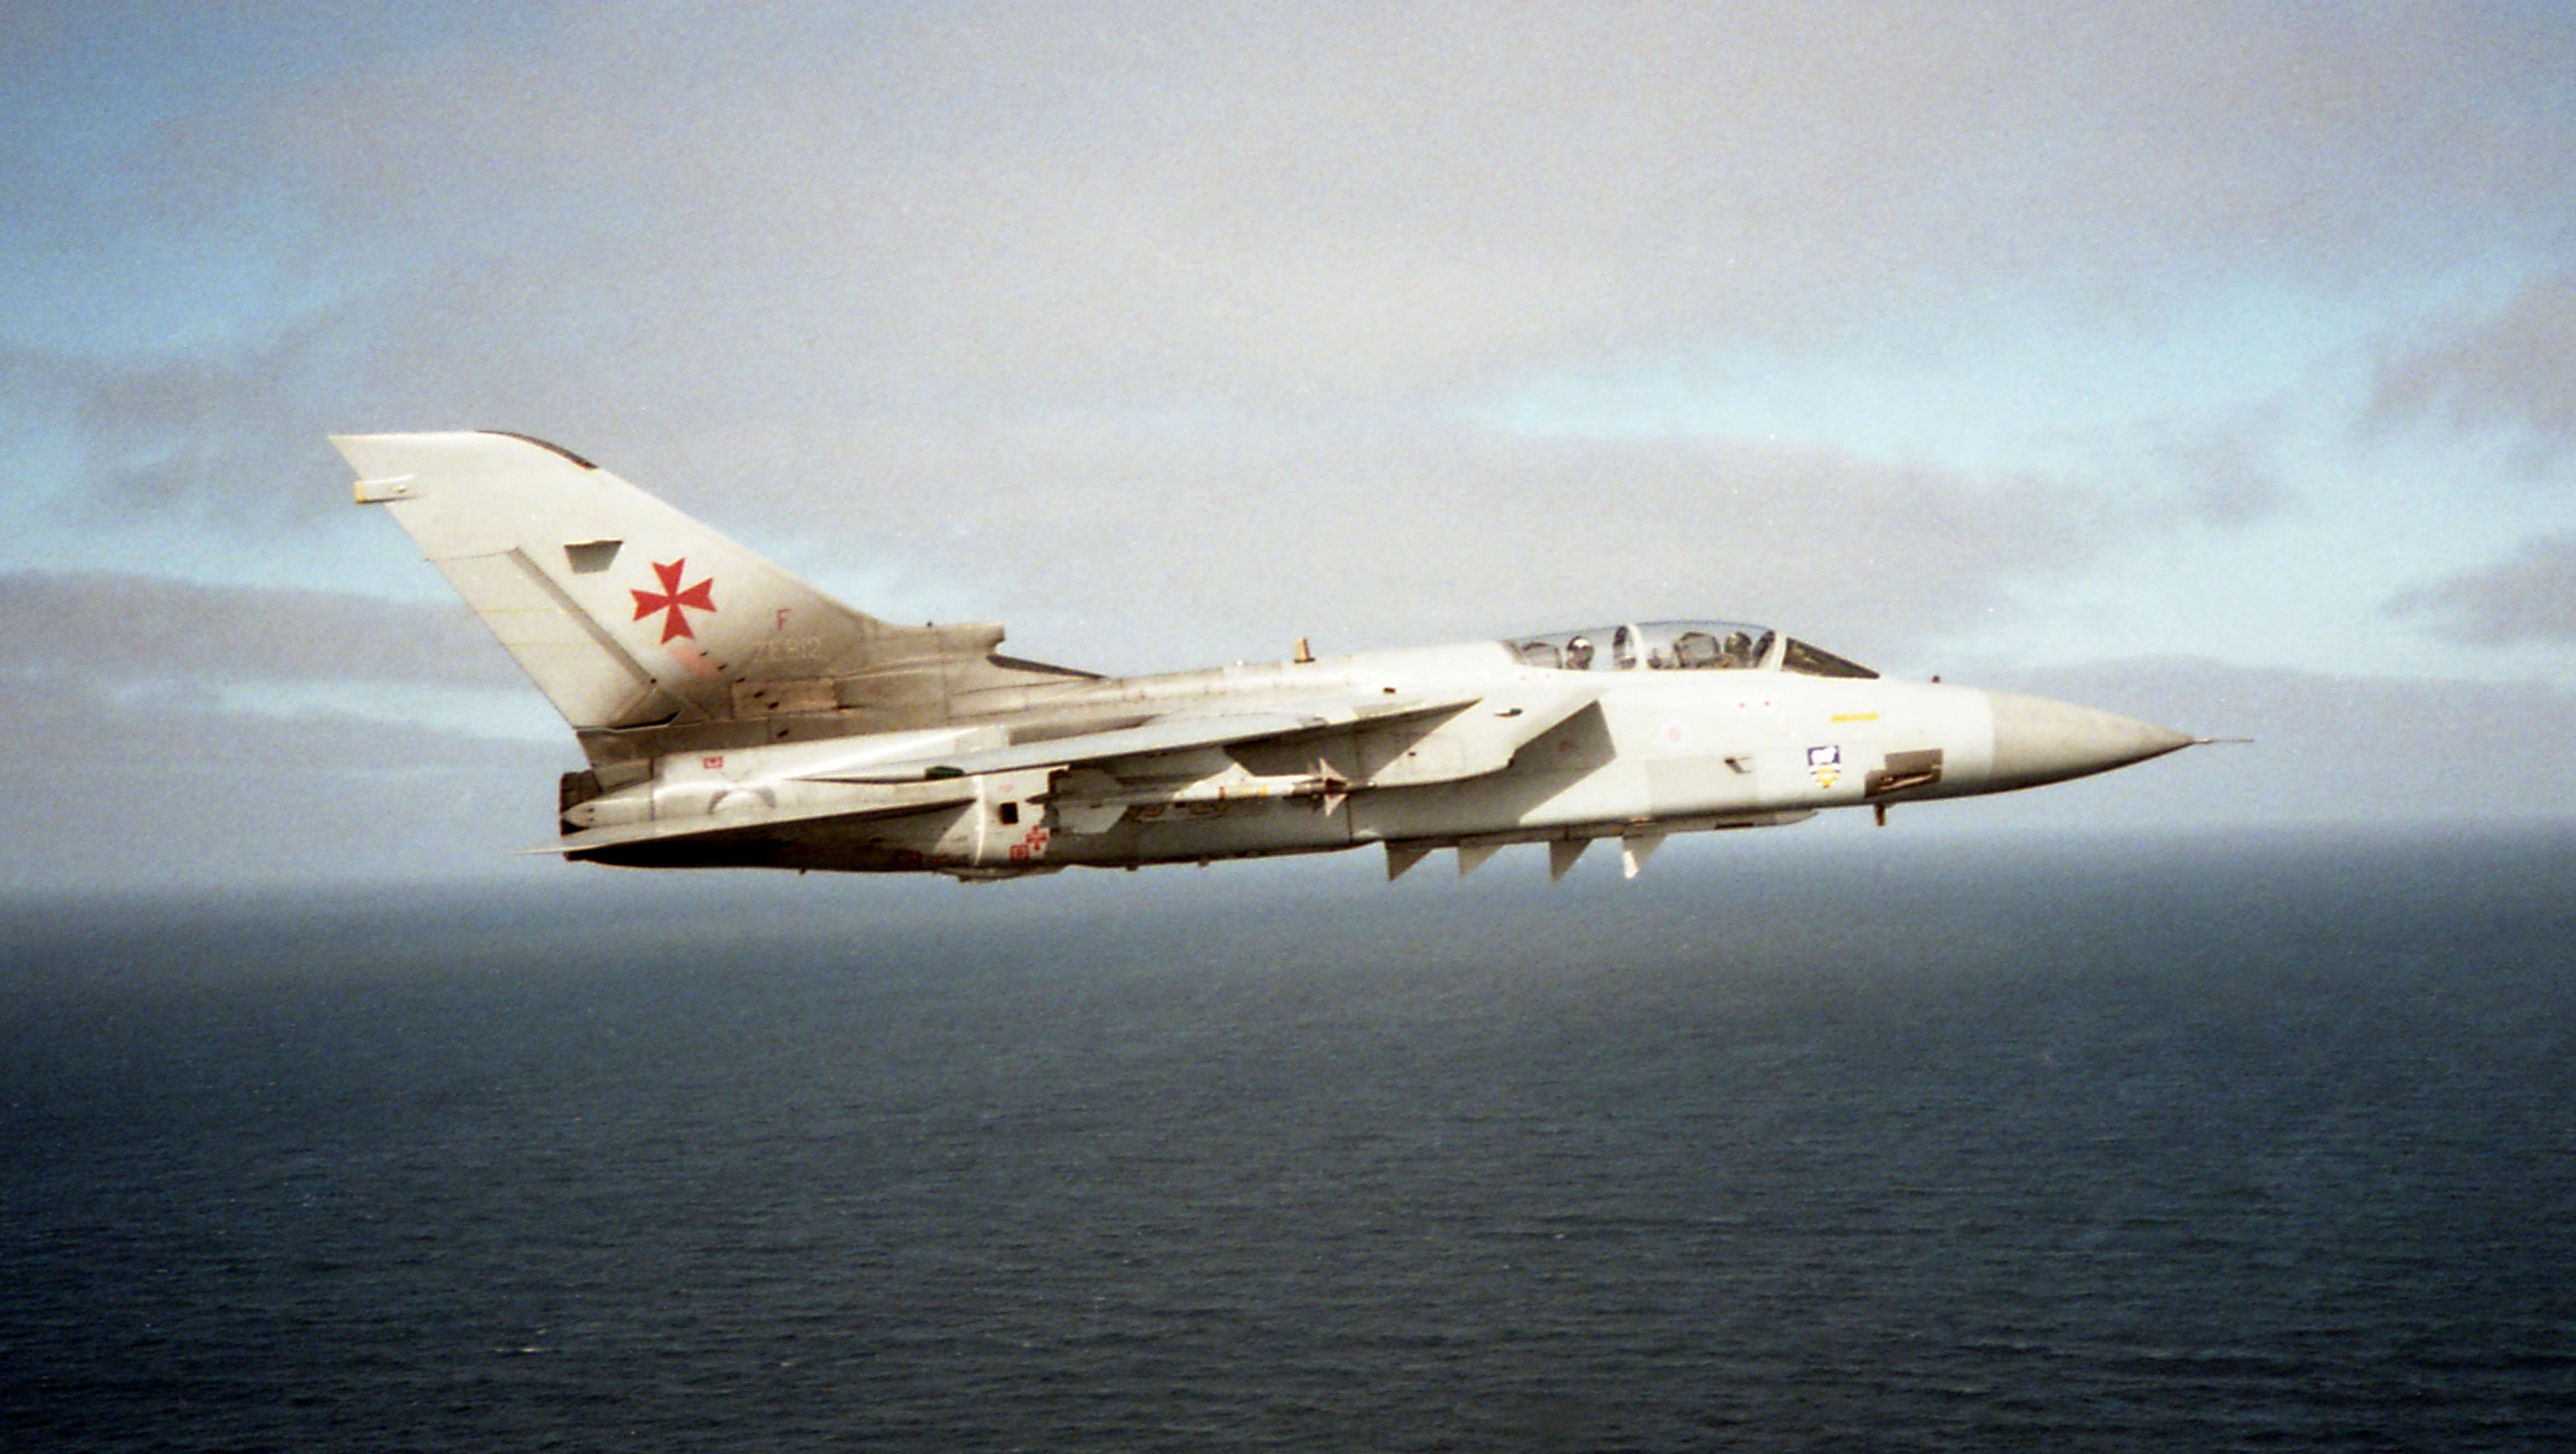 Tornado F3 - David Gledhill